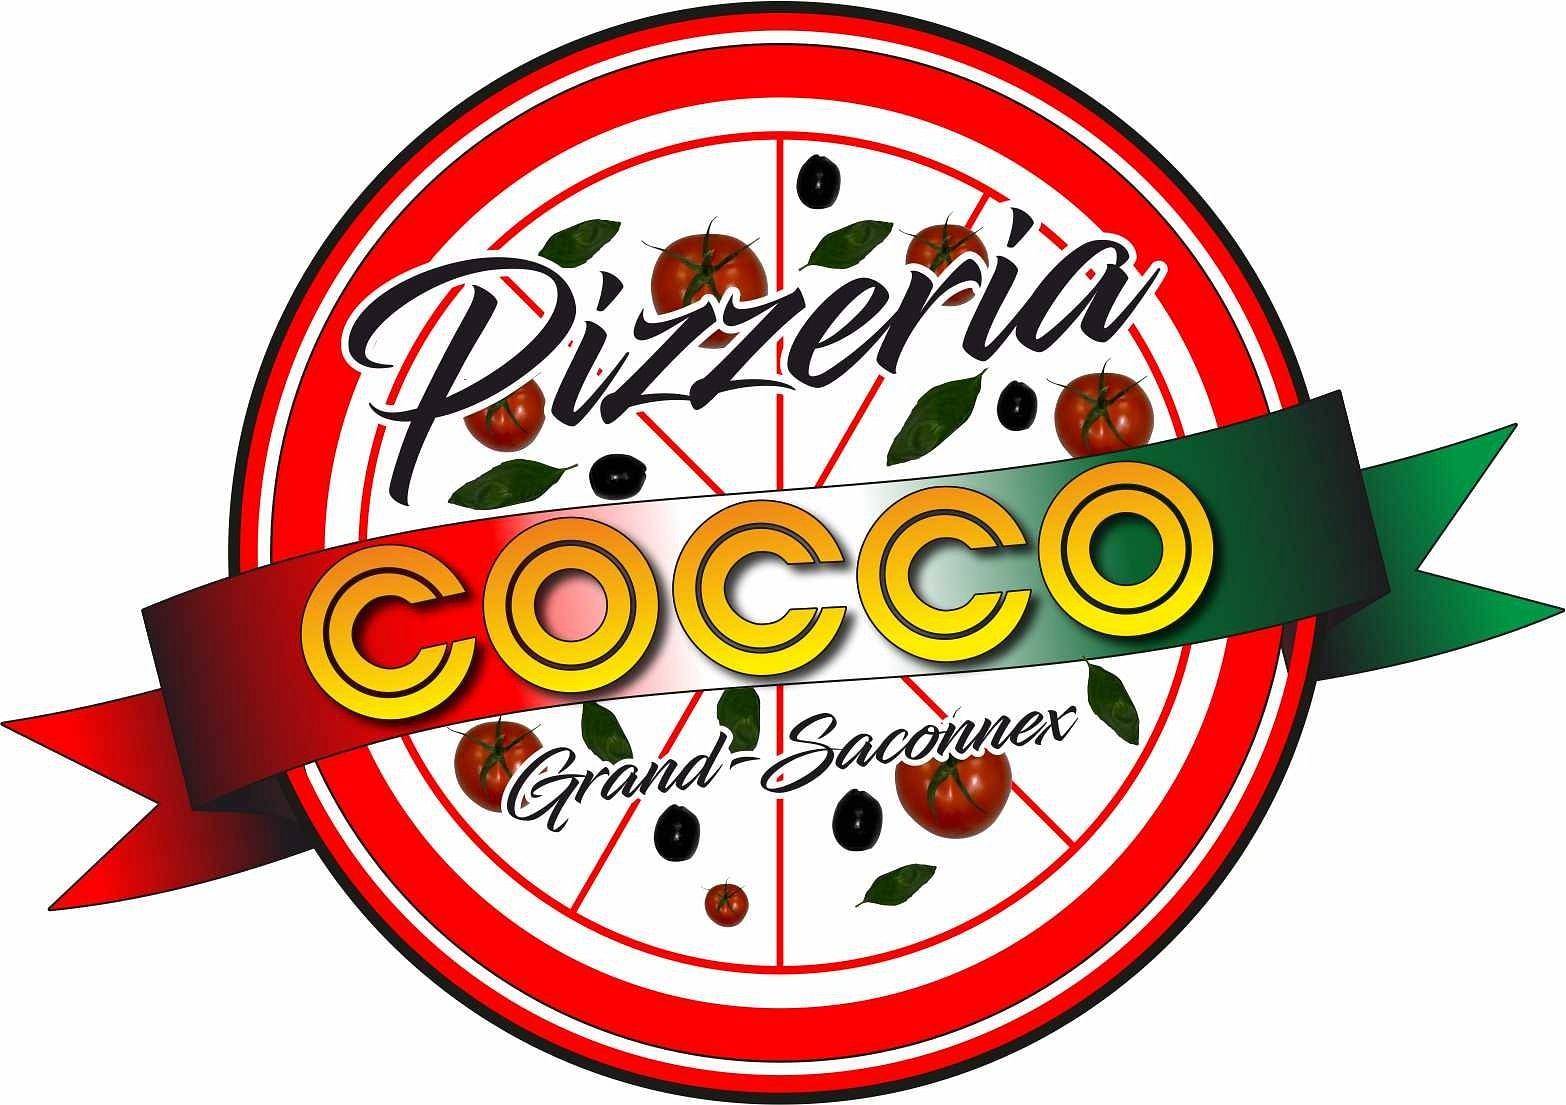 Pizzeria Cocco SA